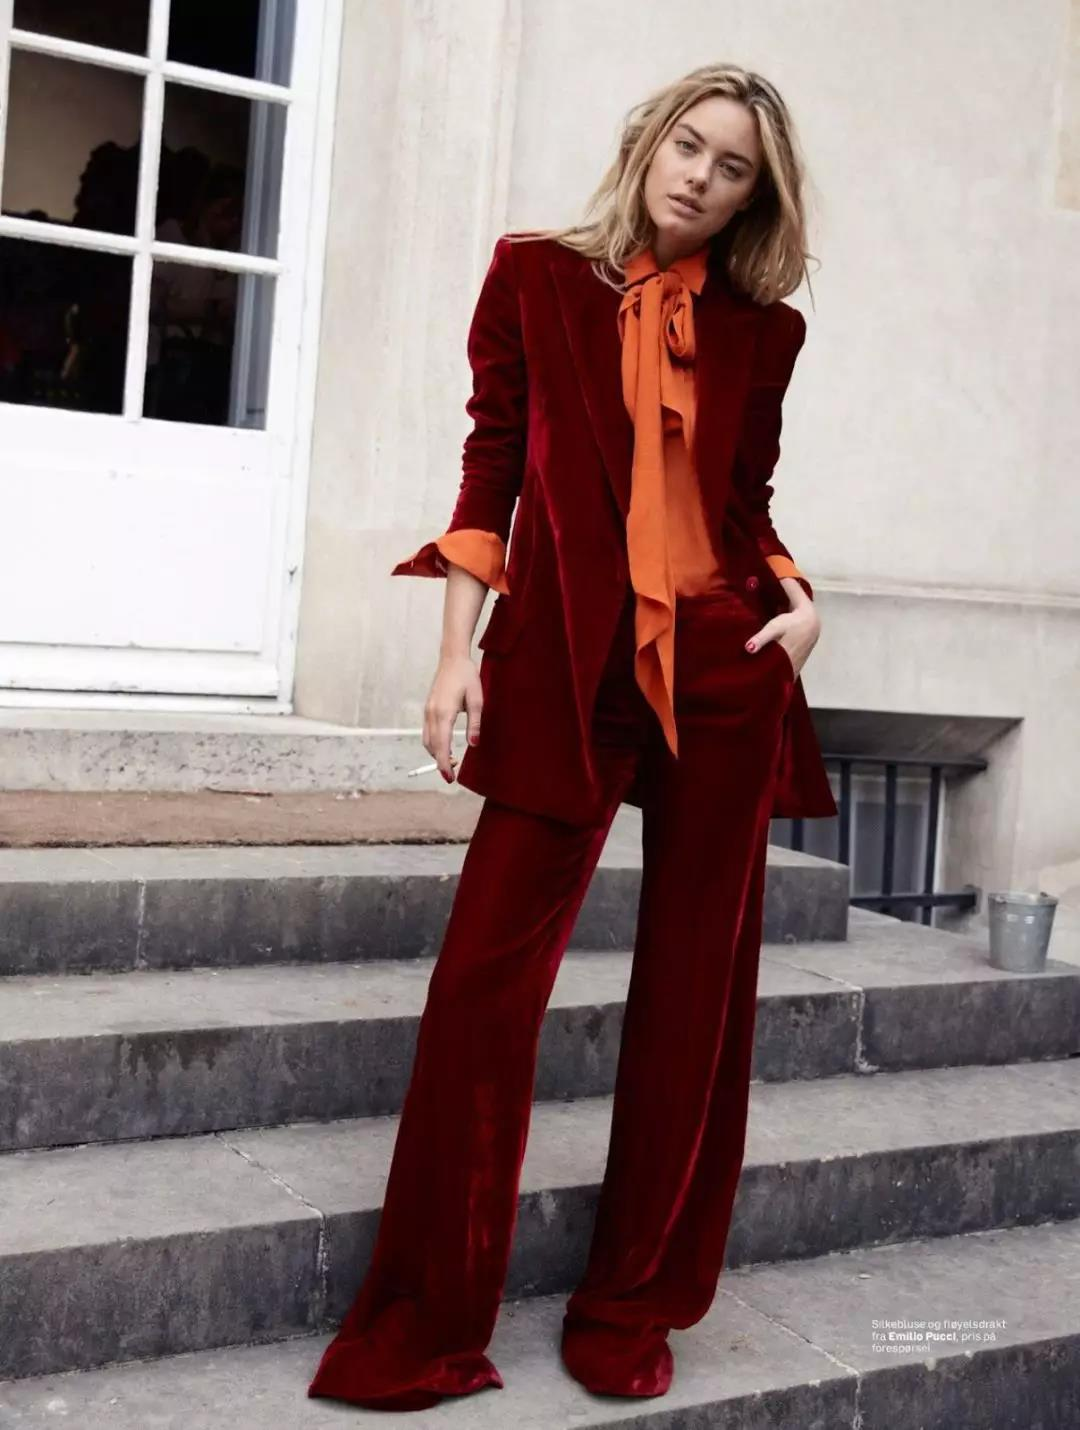 Cool feminine burgundy suit to rock